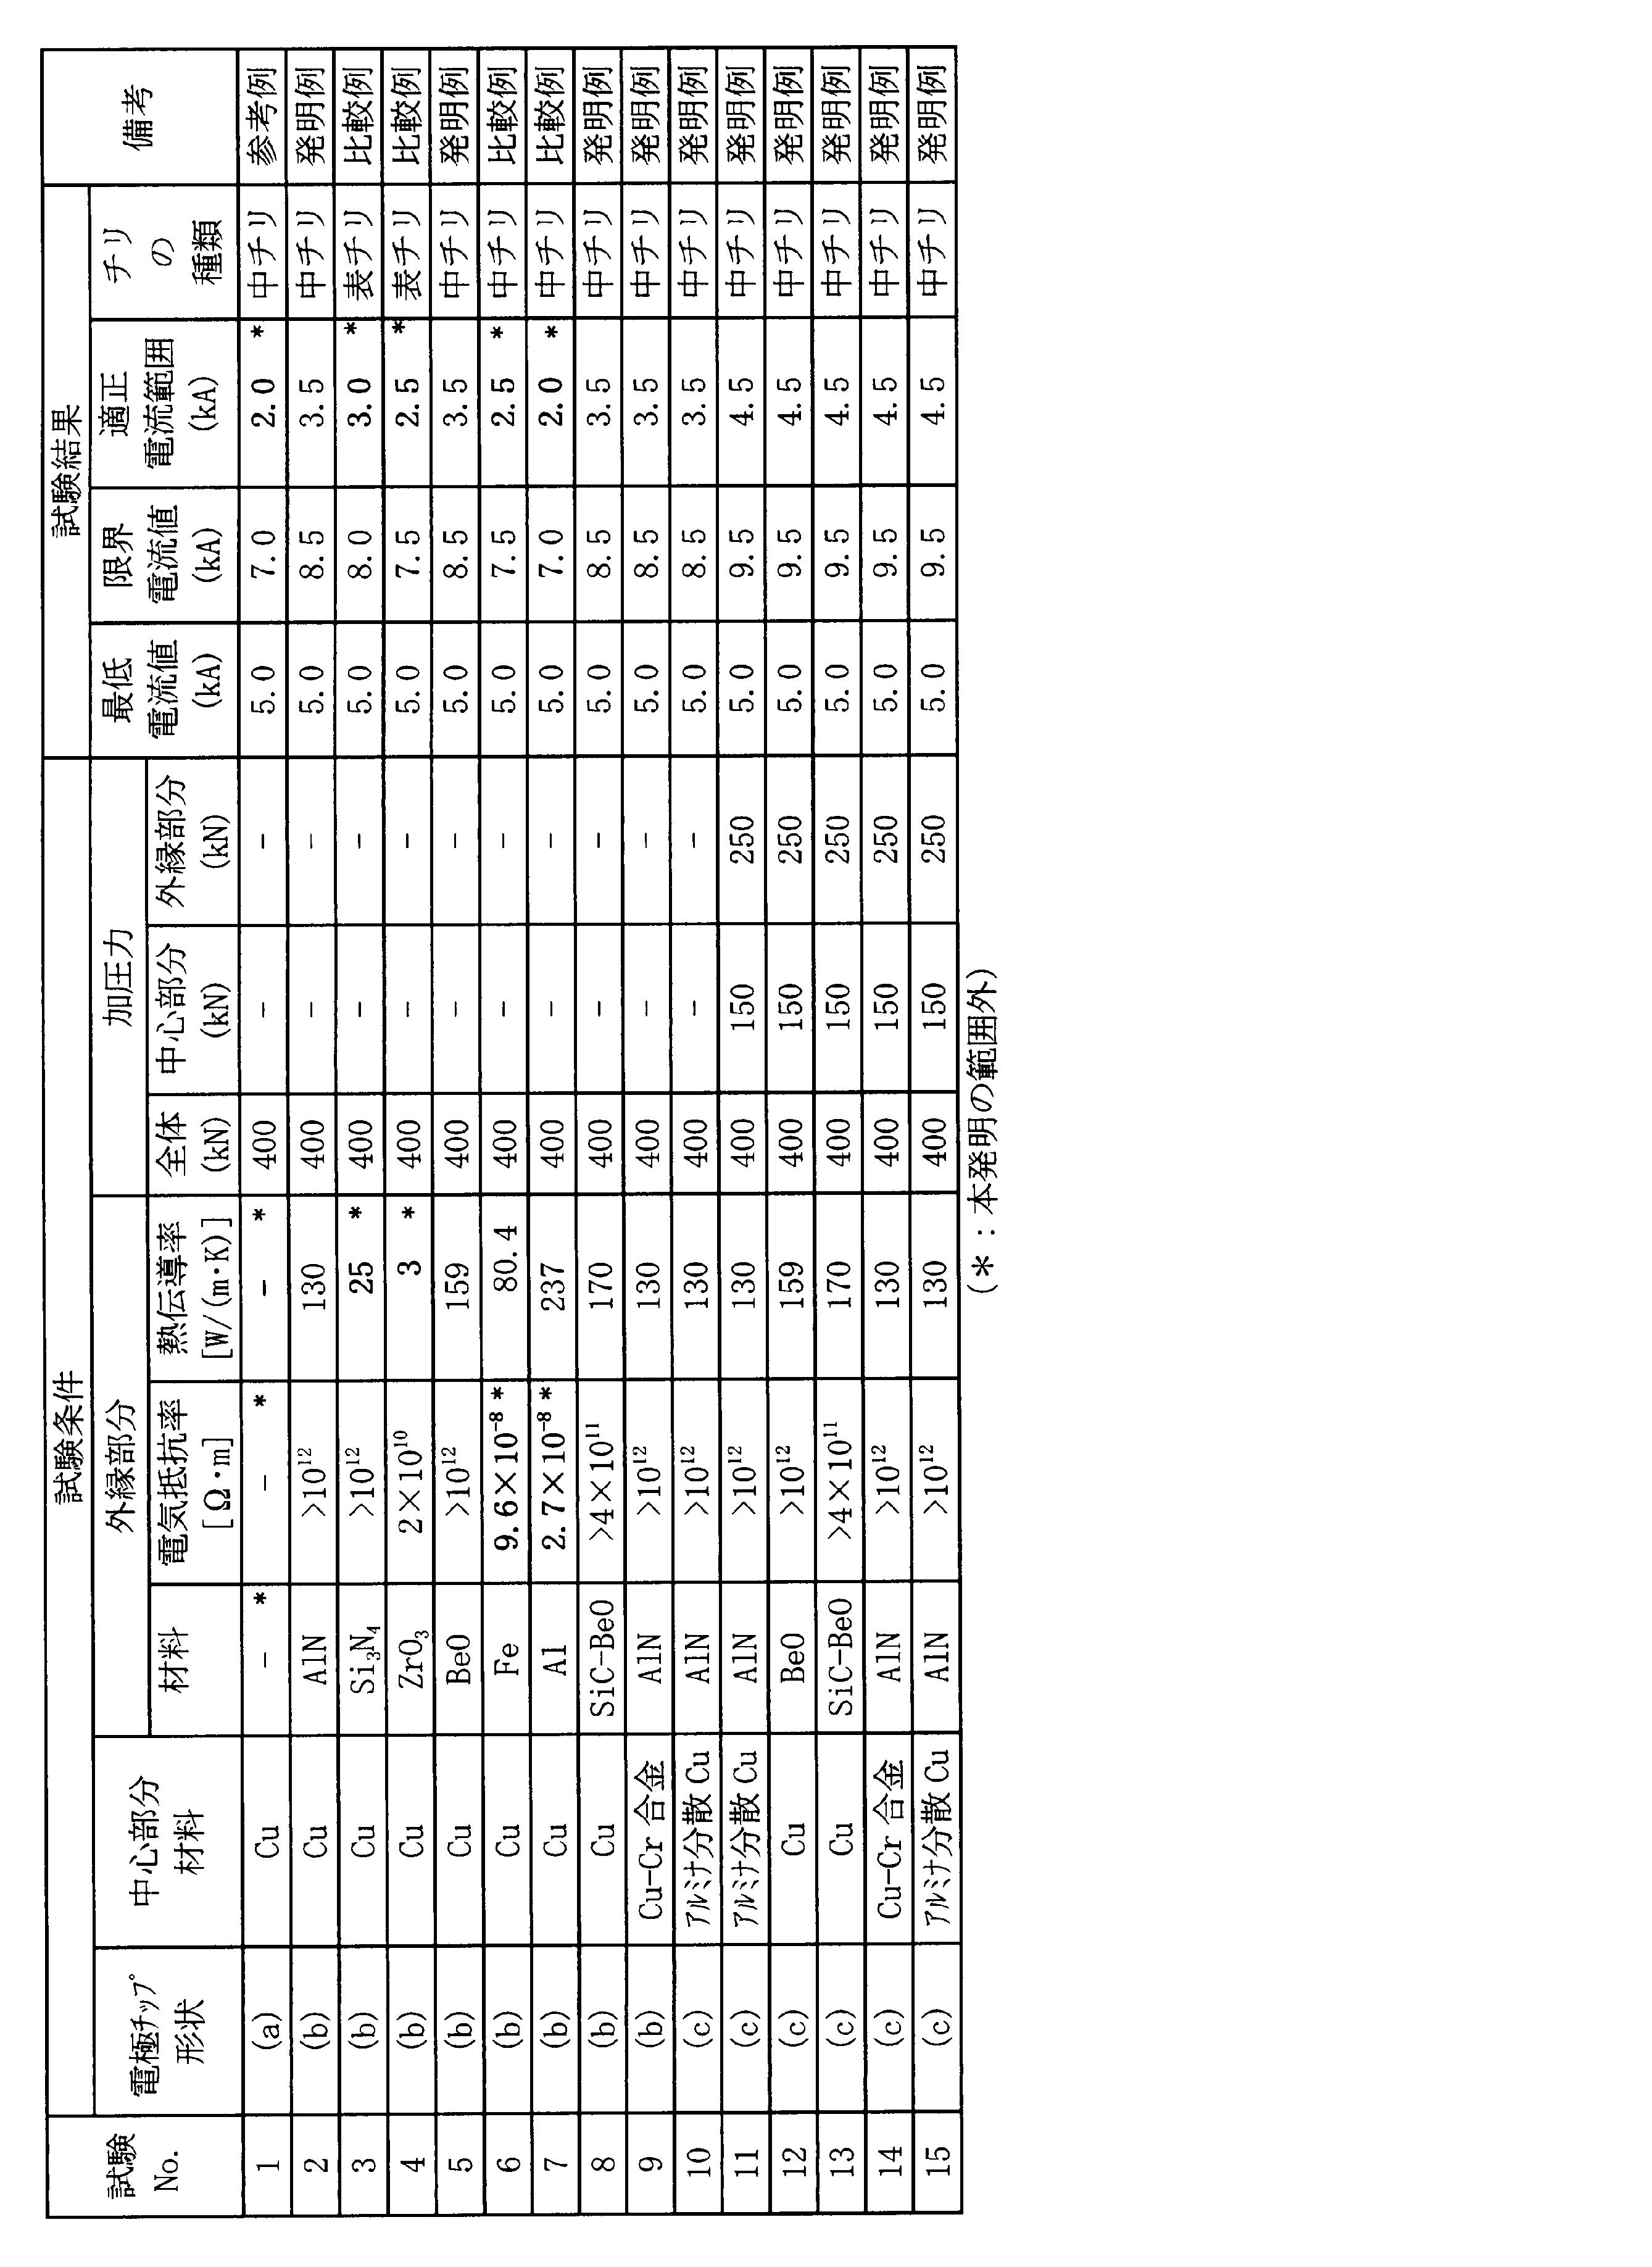 Wo2014010606a1 Spot Welding Electrode Chip Google Patents Lobe Diagram Figure Jpoxmldoc01 Appb T000001